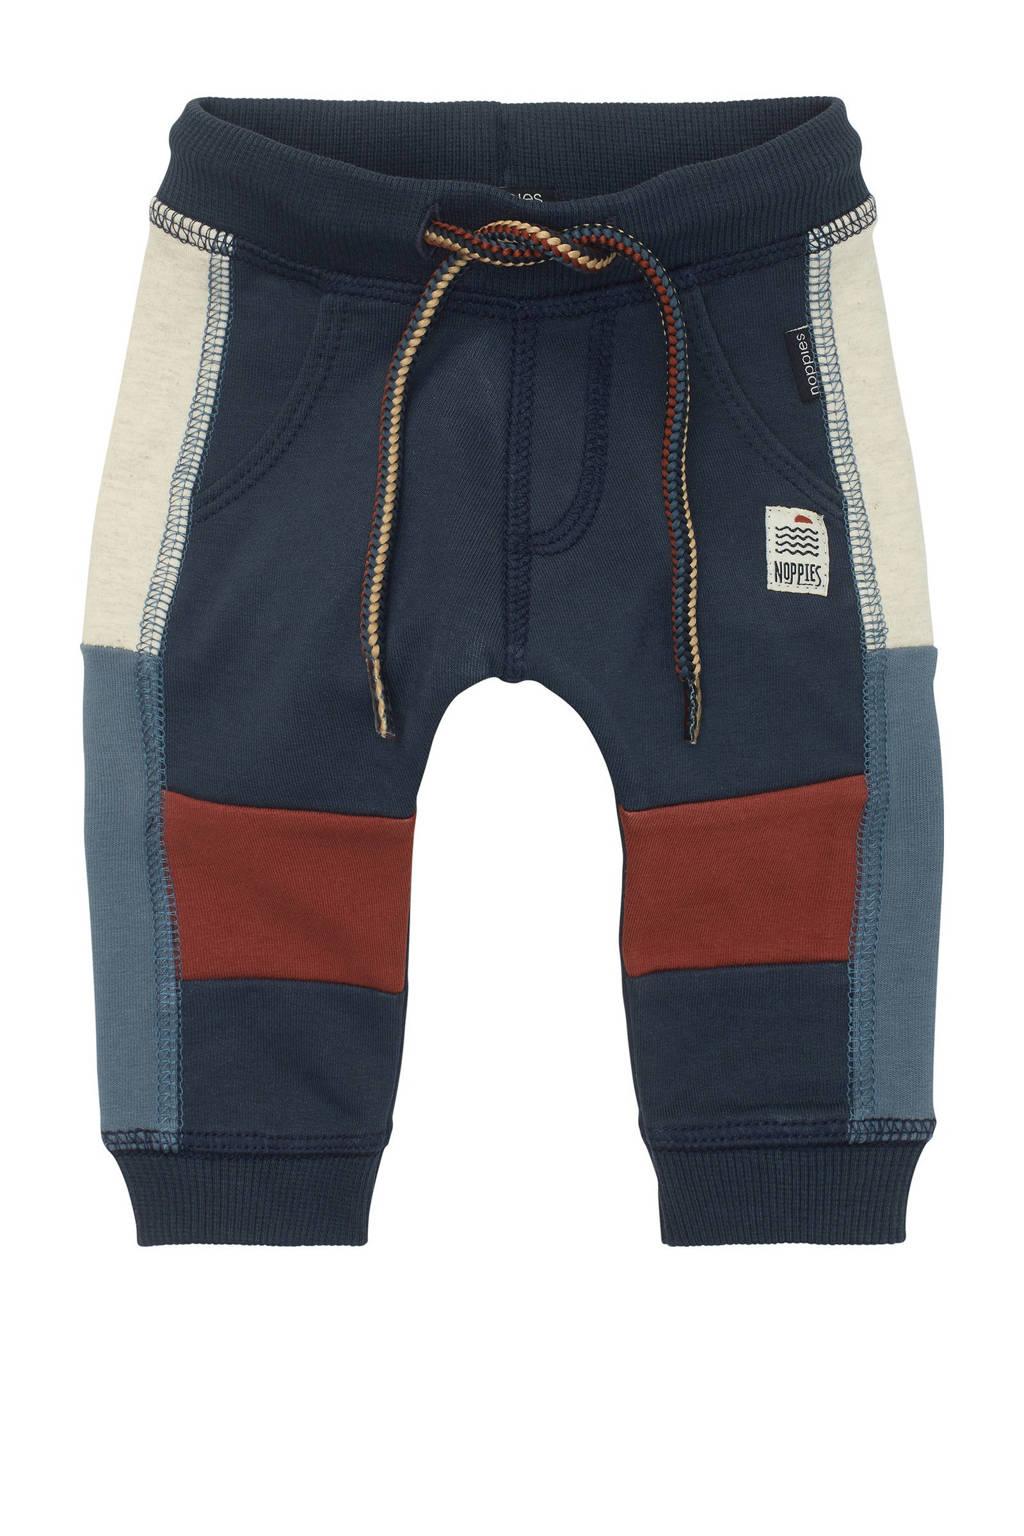 Noppies baby regular fit broek Rochdale donkerblauw, Donkerblauw